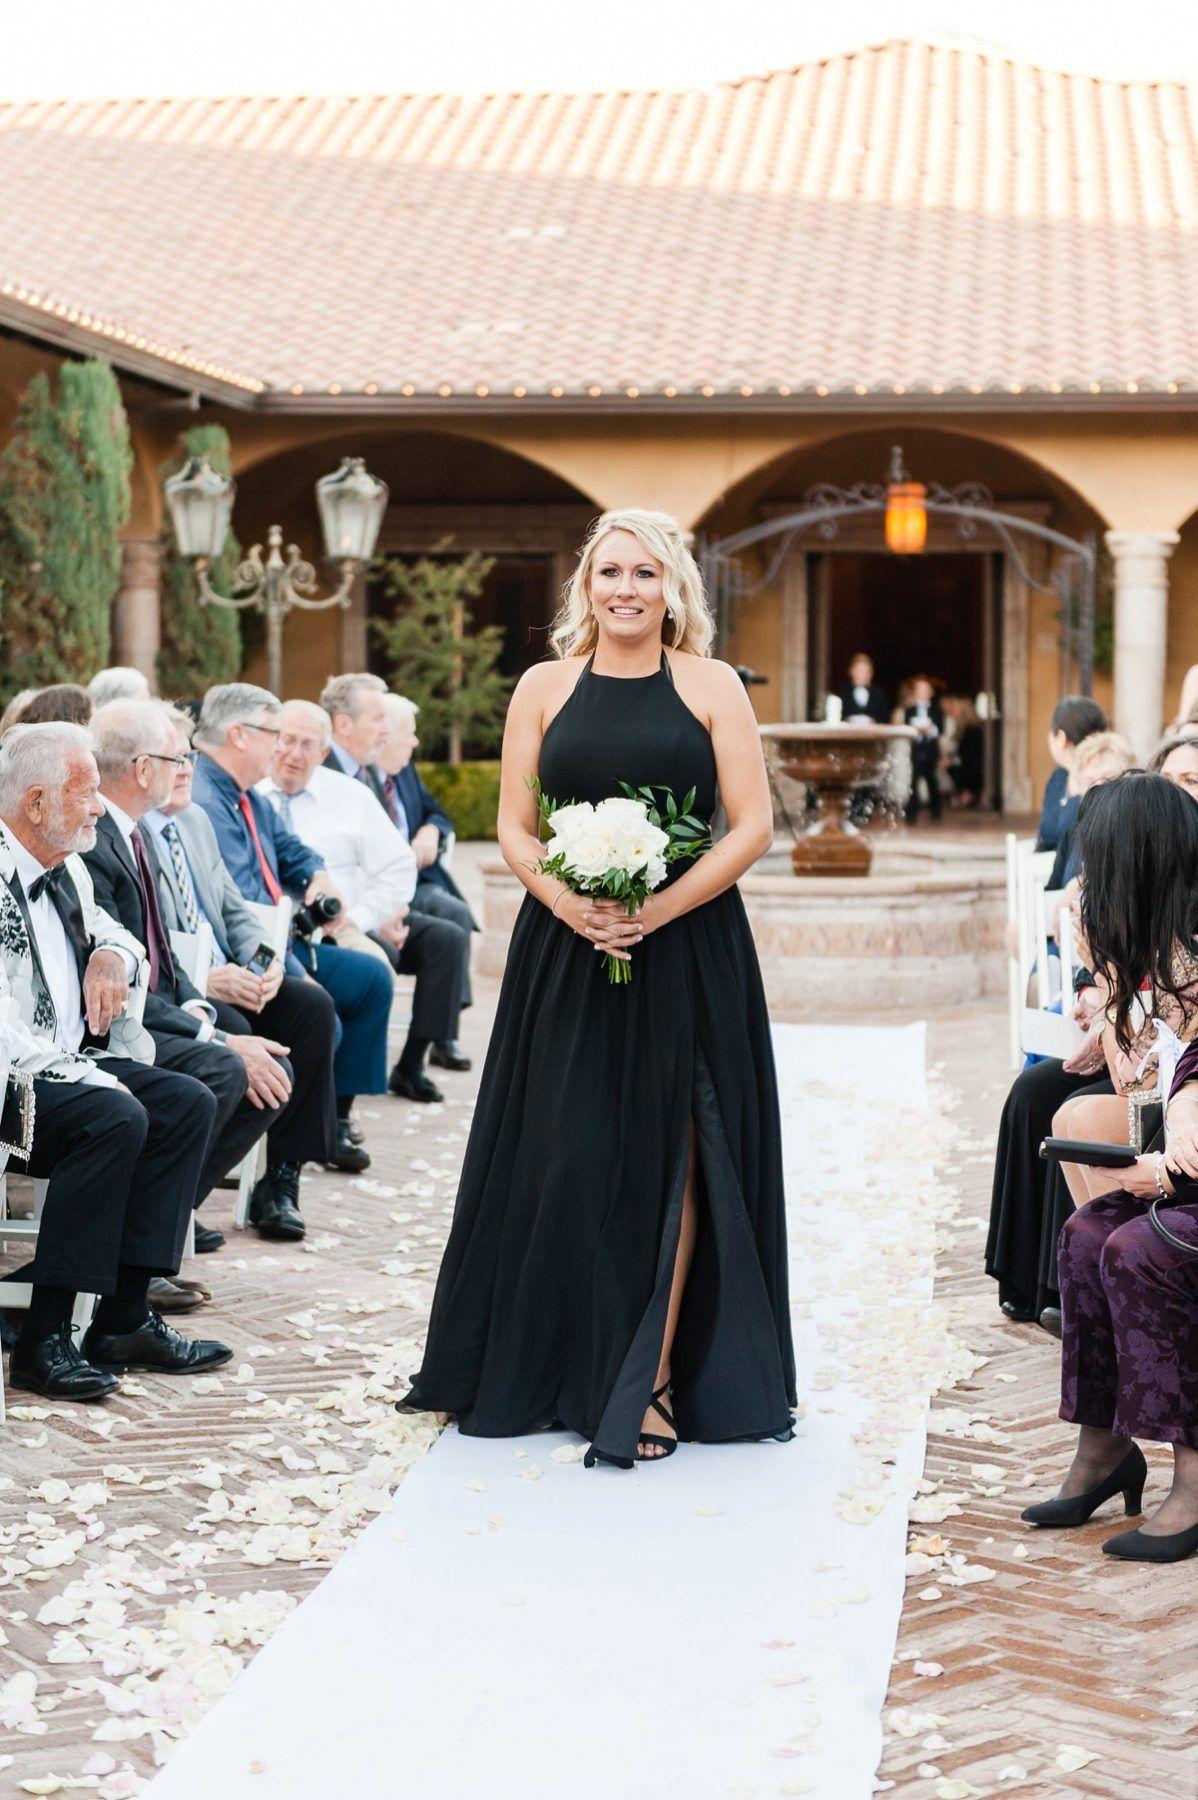 f2bf12b627c Azazie Bridesmaid Dresses  5 Reasons We Love Them